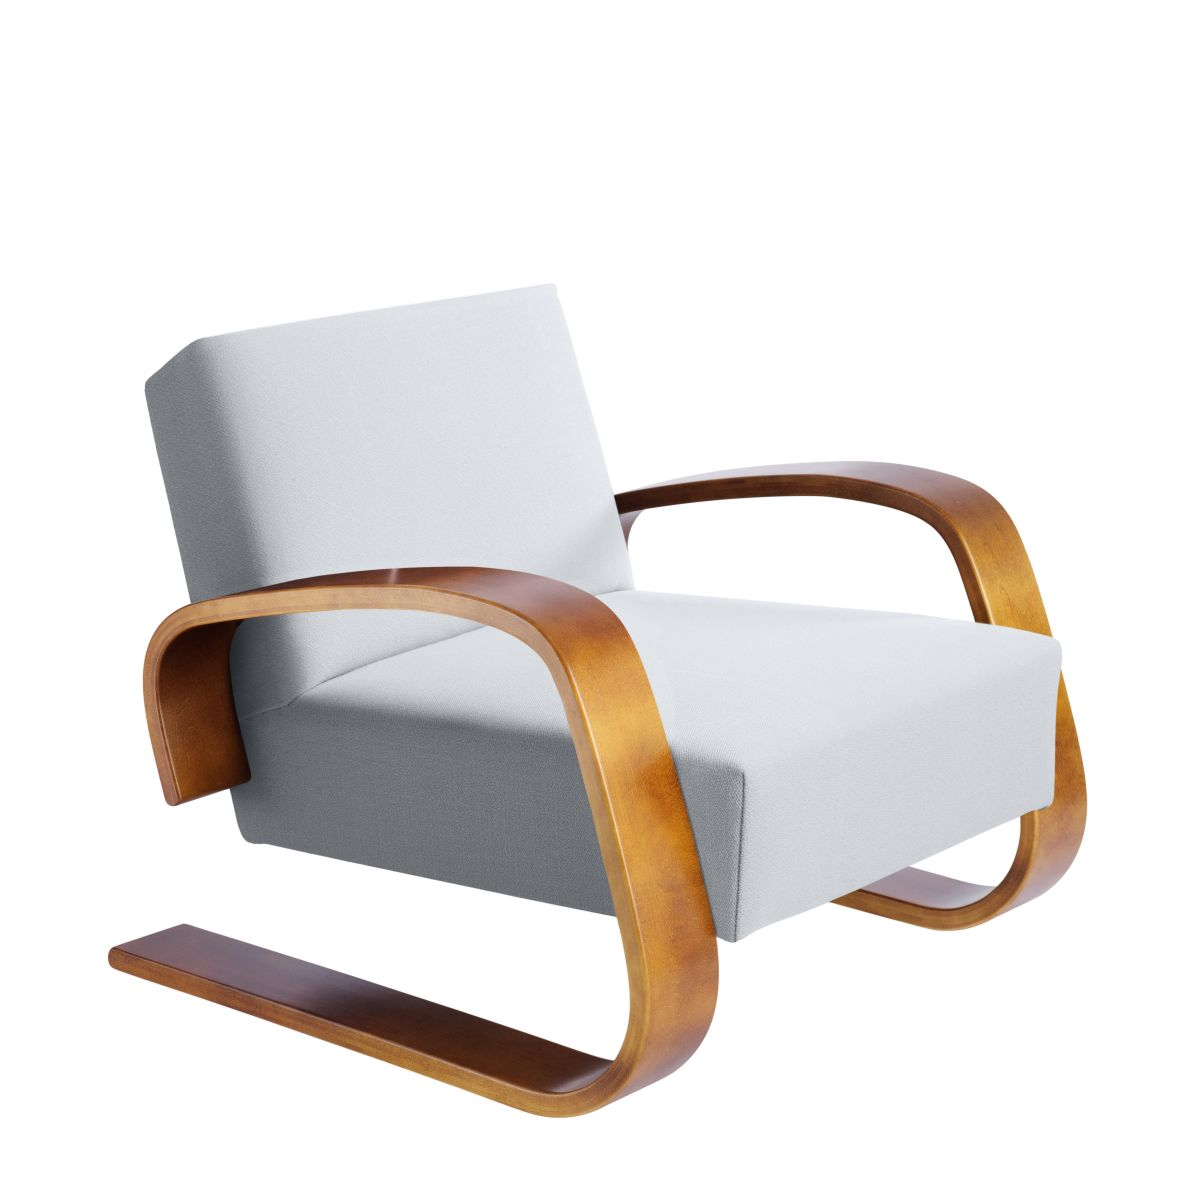 Armchair 400  Tank Legs Walnut Stain Seat Fabric Upholstery Artek Grey 2494498